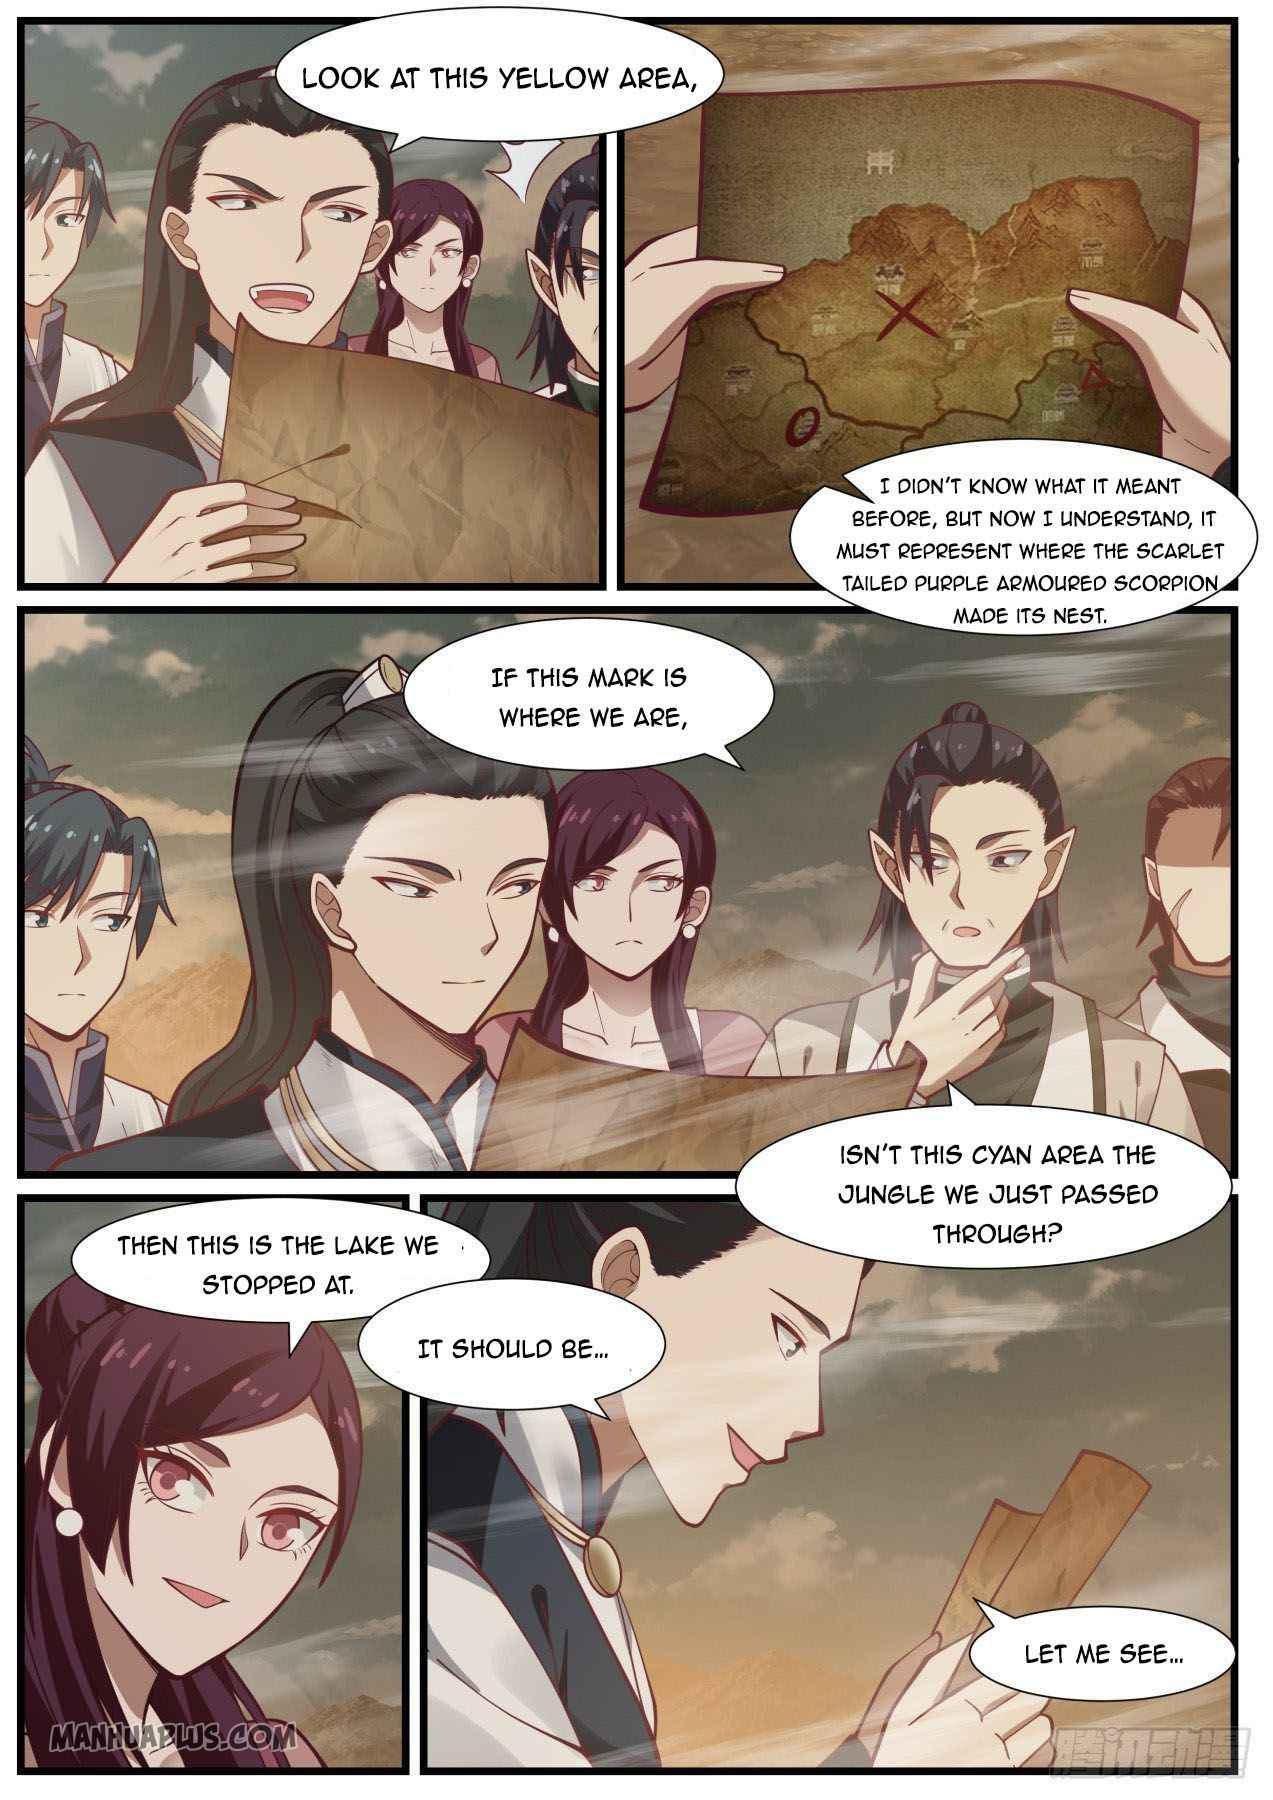 Martial Peak - chapter 975-eng-li